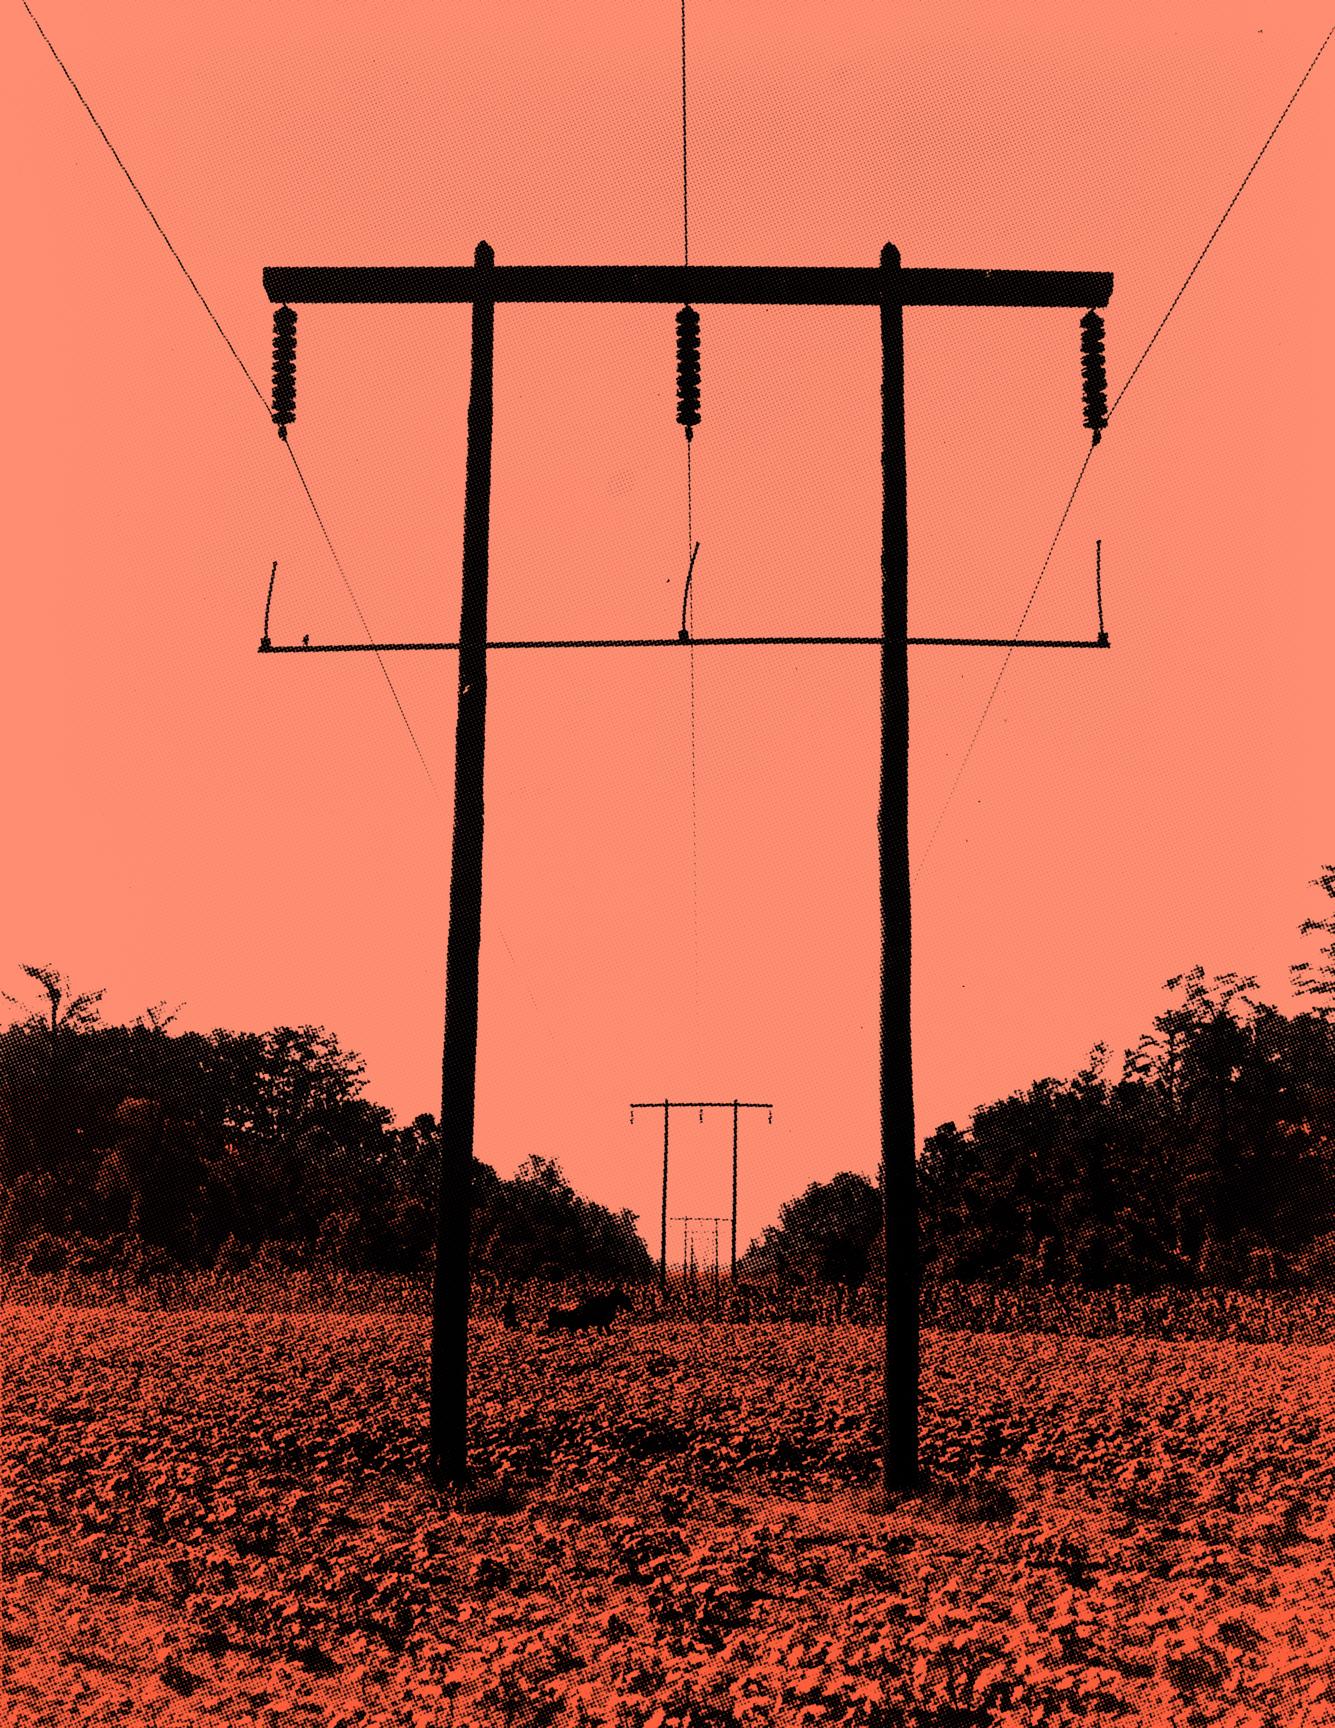 Original title: Rural electrification in Pulaski County, Arkansas. Dorothea Lange, June 1938.